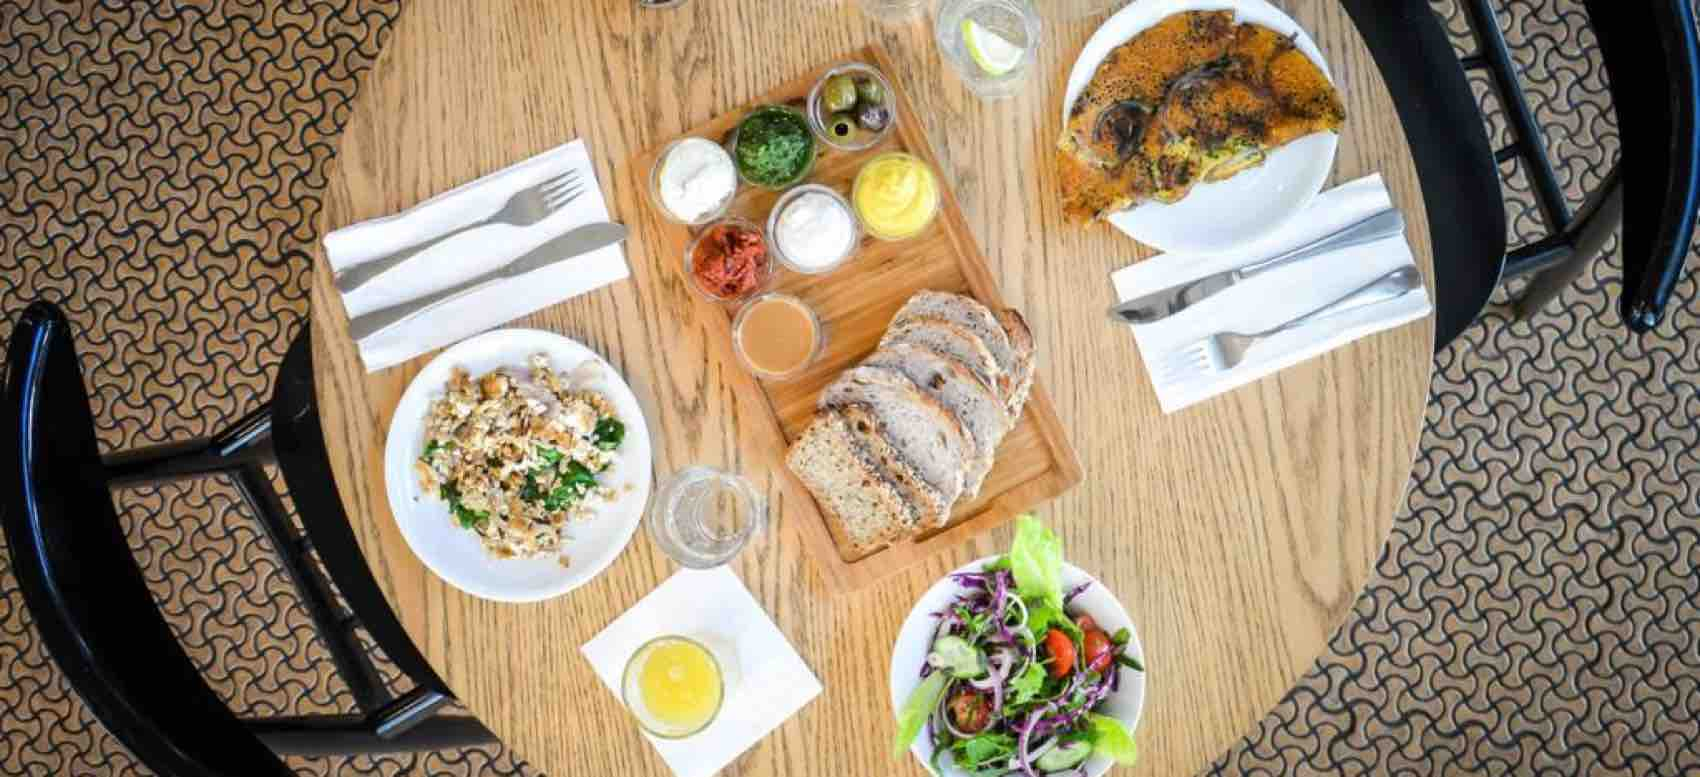 Iconic Tel Avivian café Anastasia opened its doors in 2014